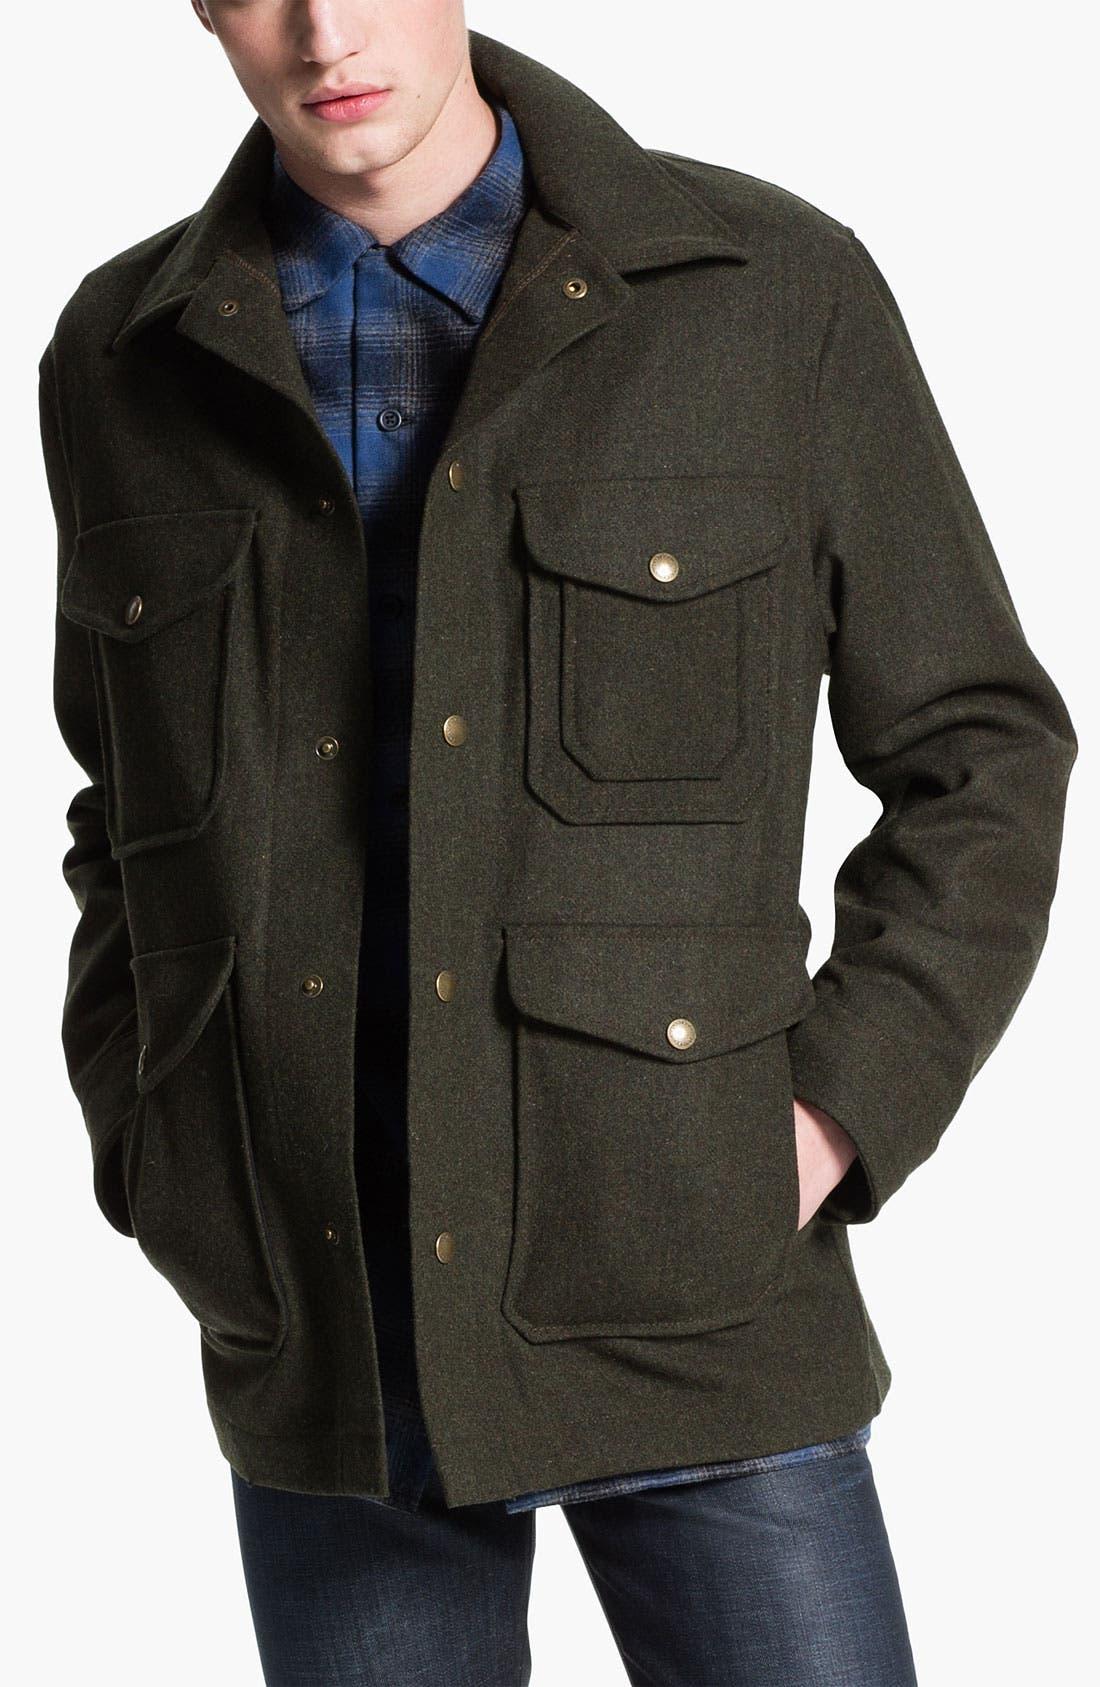 Alternate Image 1 Selected - Pendleton 'Oxbow' Field Jacket